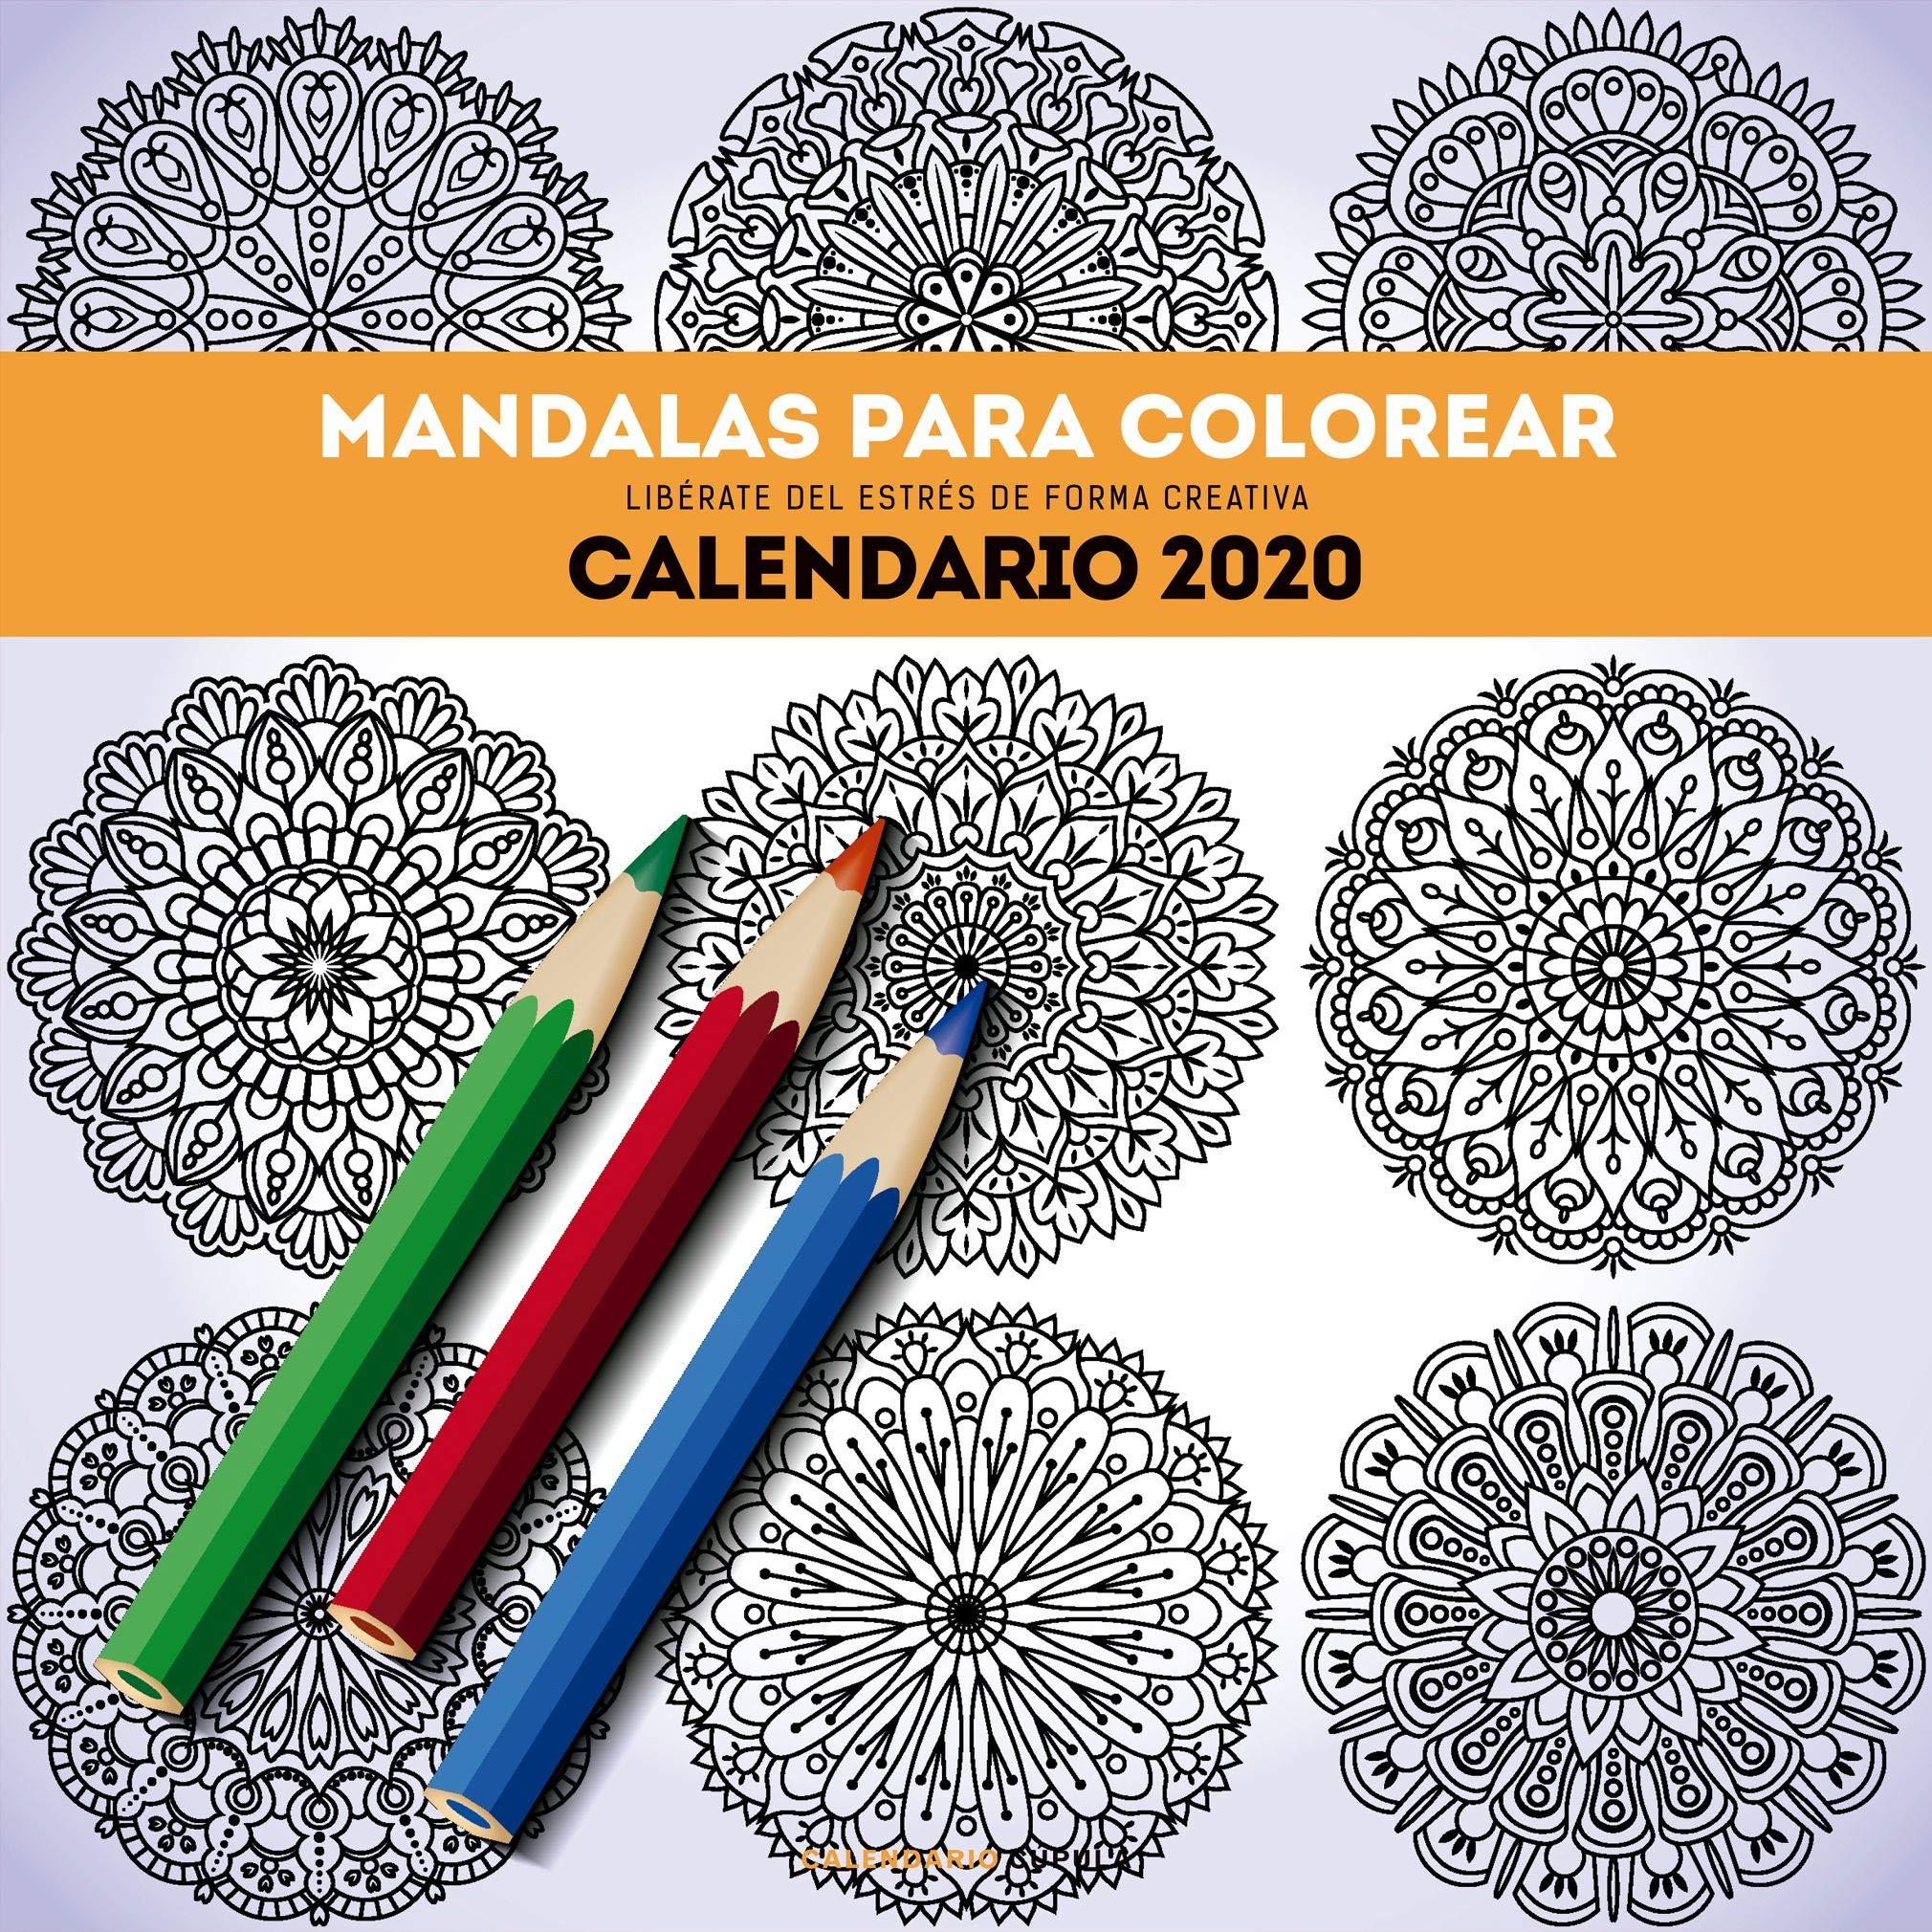 Calendario Mandalas para colorear 2020 Calendarios y agendas ...